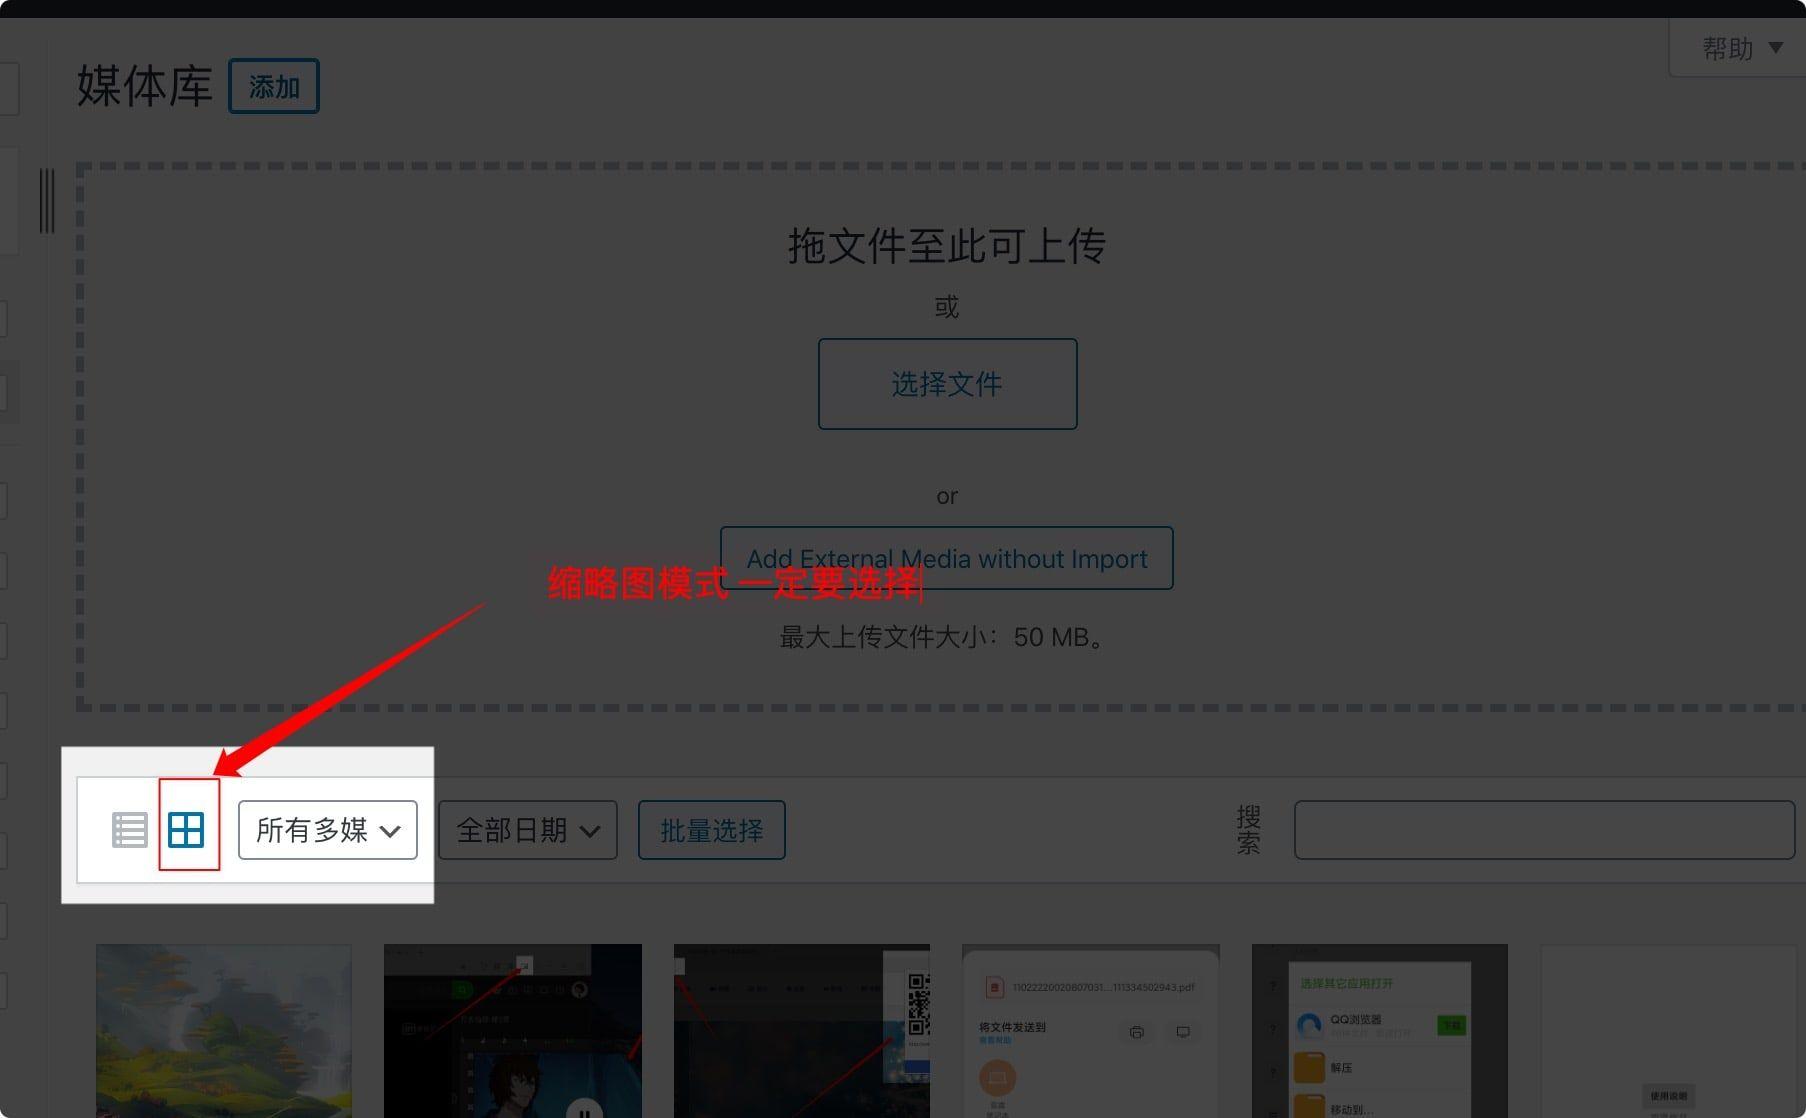 5e57941993dc6 - External Media without Import 上传图片自动跳转页面